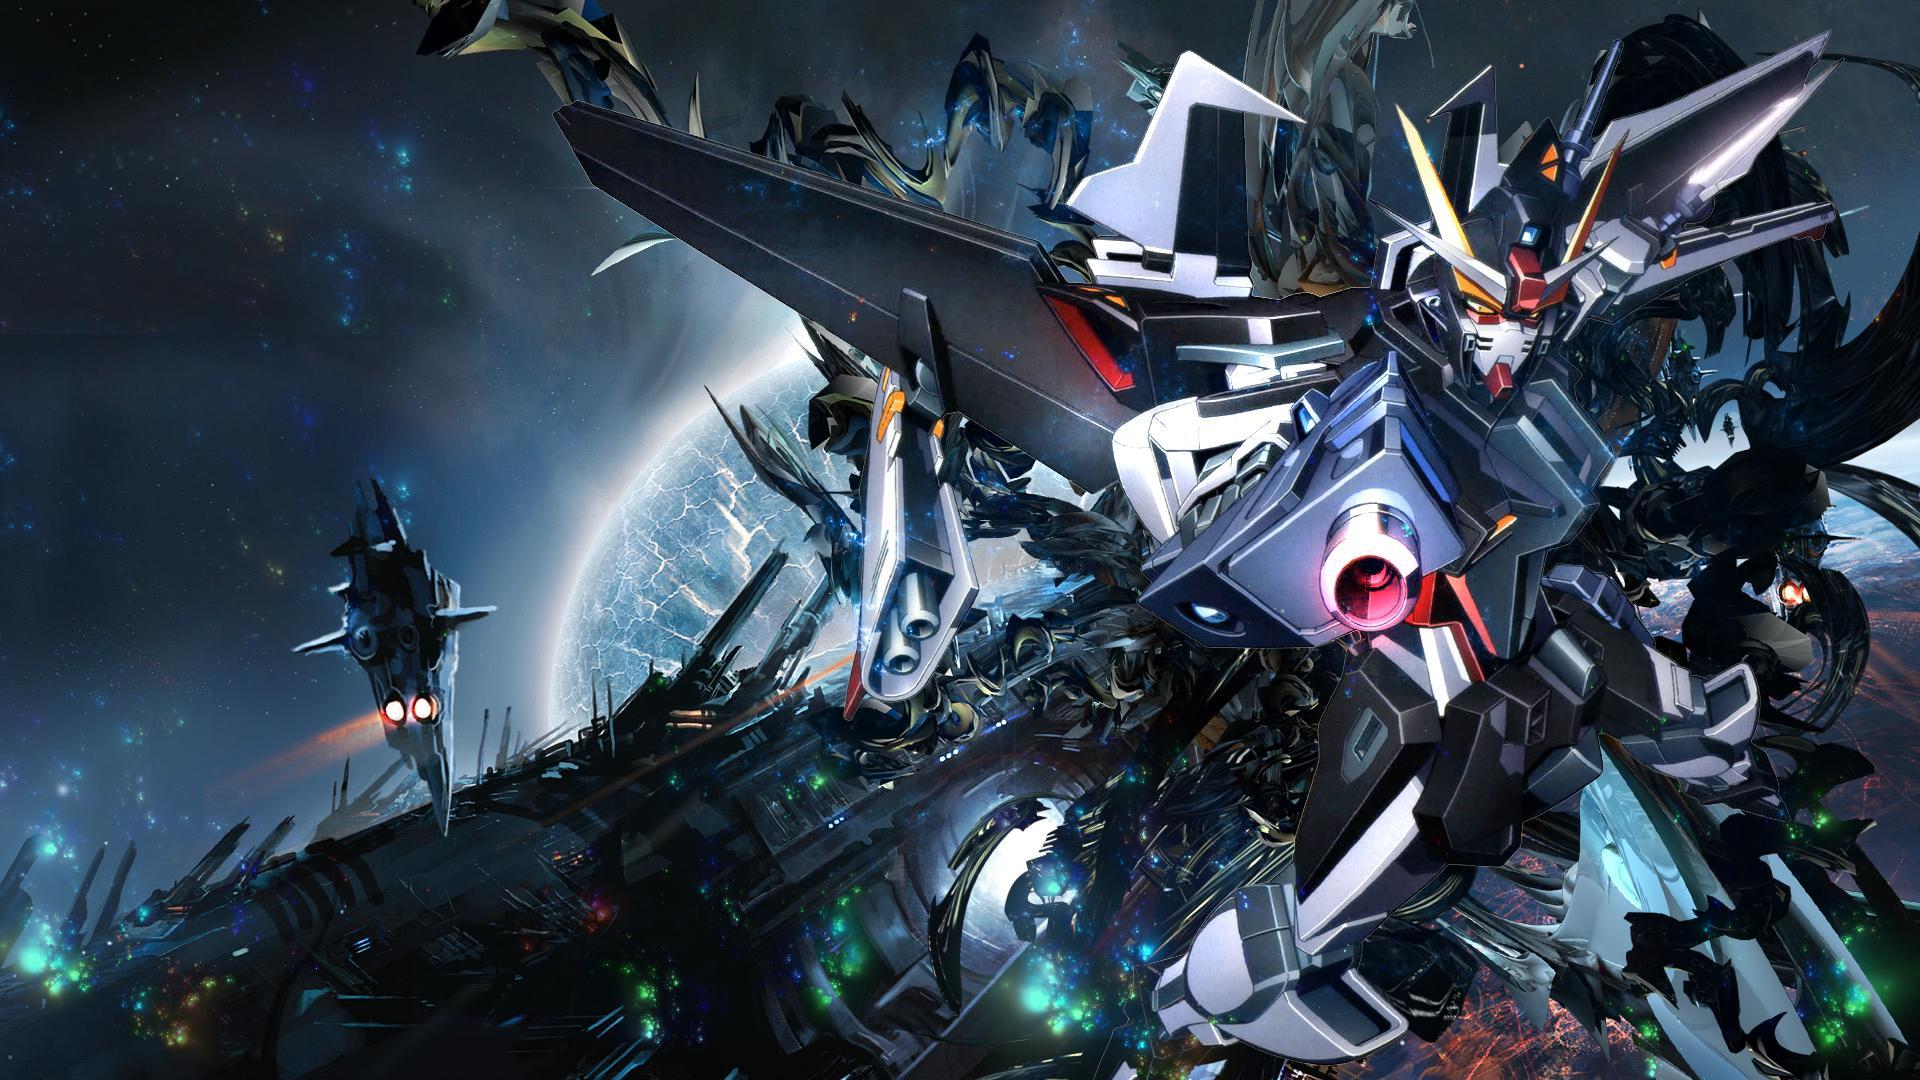 Gundam HD Wallpapers - Wallpaper Cave